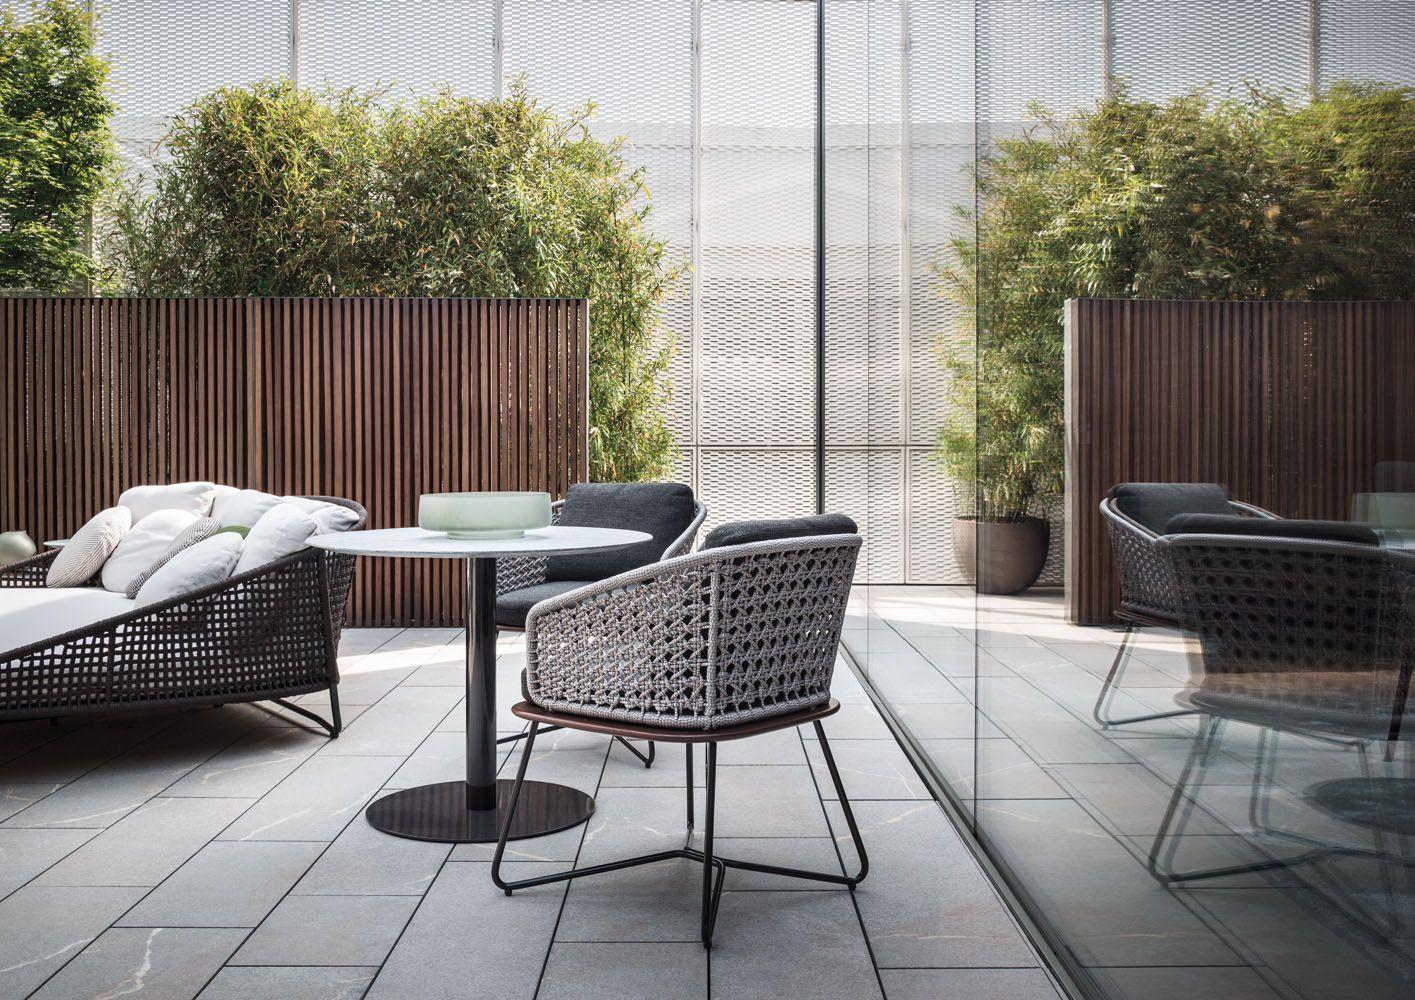 minotti sofas australia klaussner vaughn sofa reviews outdoor collection rivera little armchair